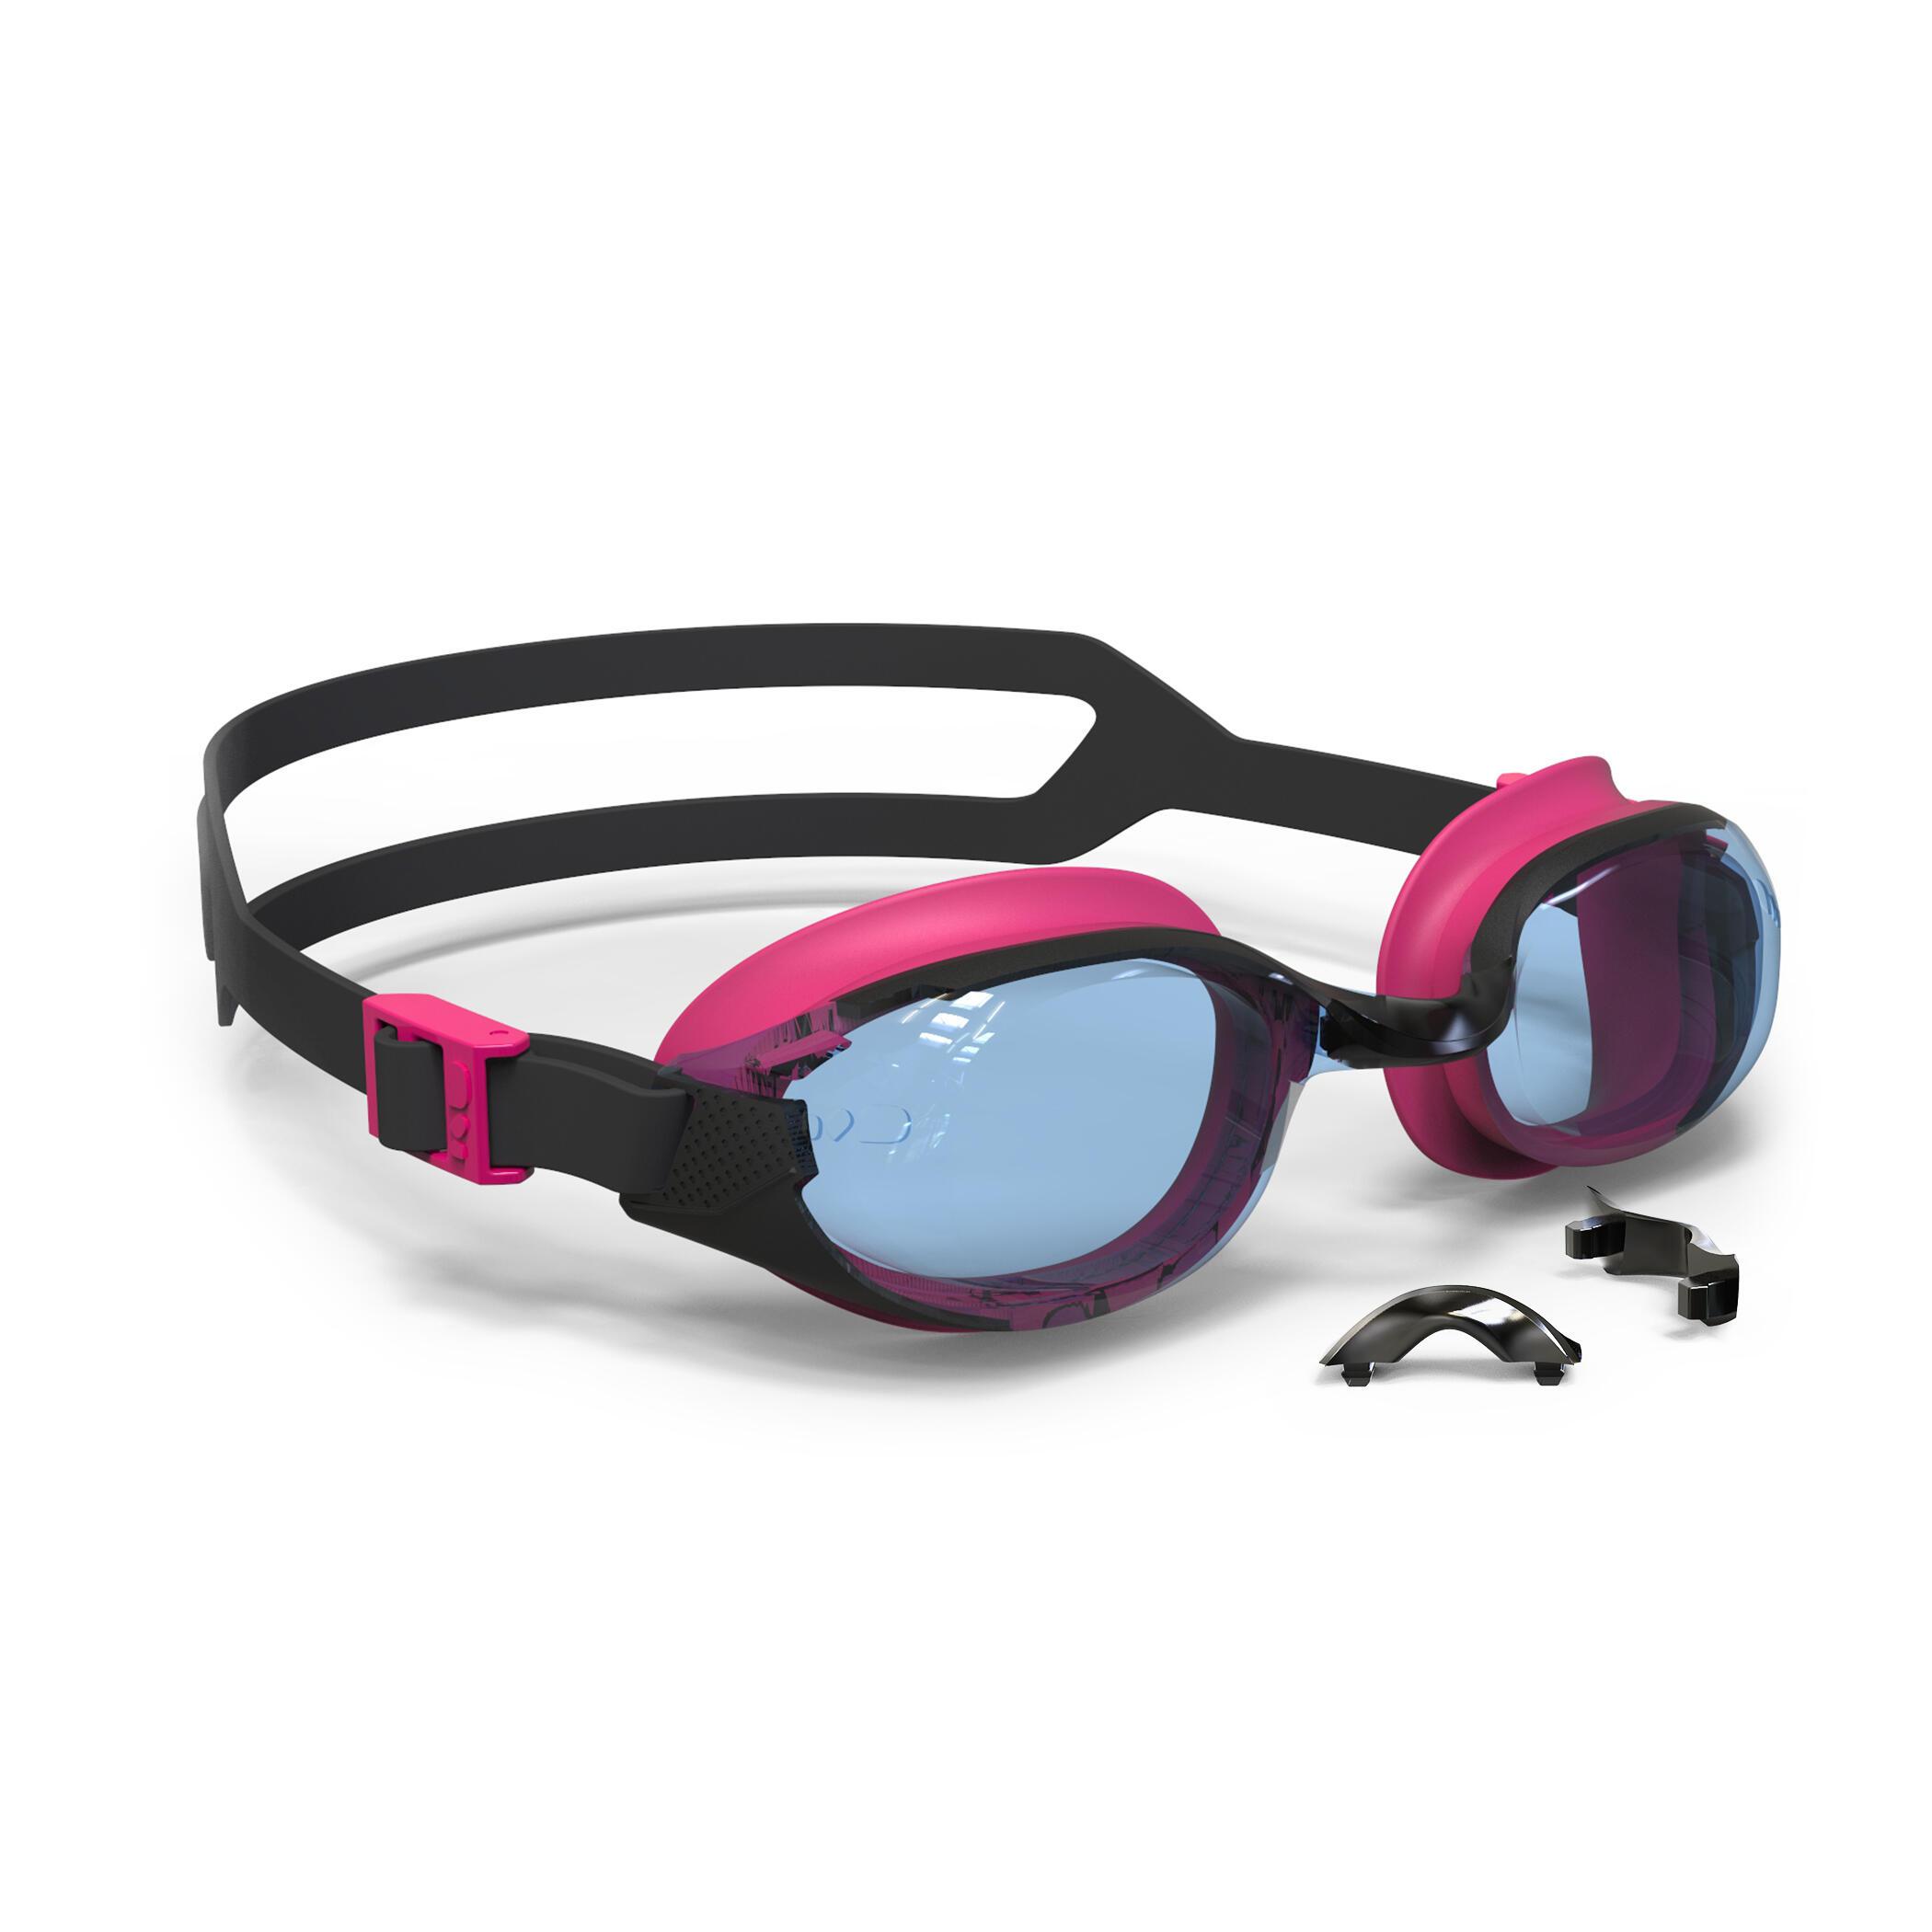 bc957137abb2a4 Nabaiji Zwembrilletje 500 B-Fit zwart/roze lichte glazen | Decathlon.nl